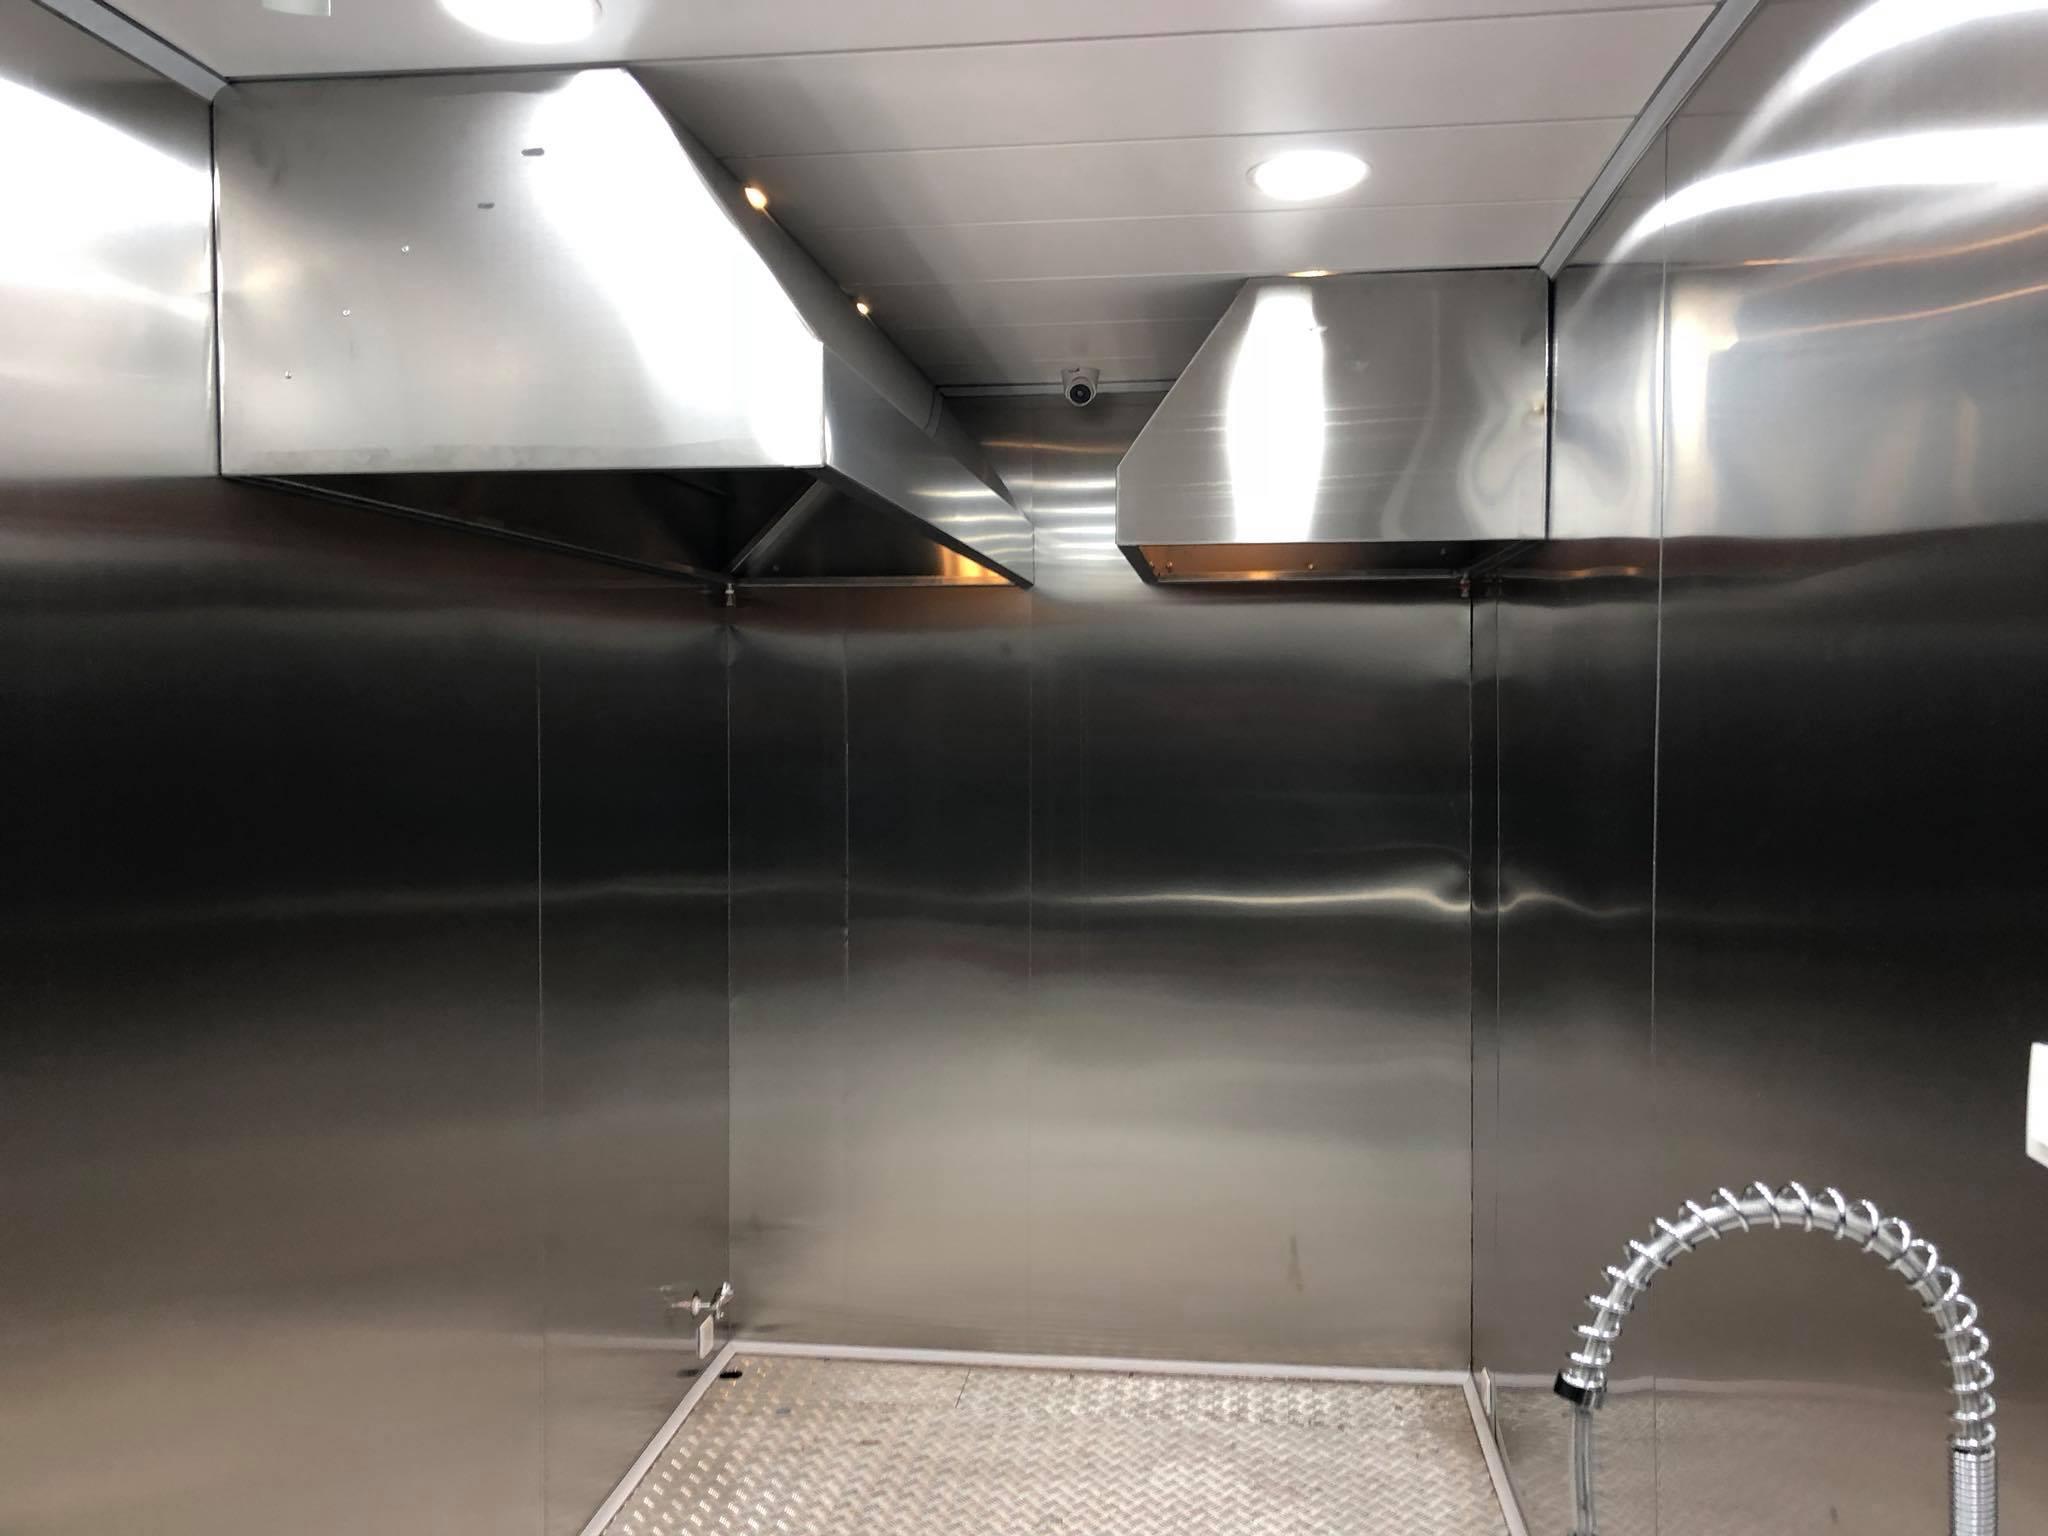 Fast Food Divisible Cabin, Mobil Divisible Restourant ve Bölünebilen Gıda Kabini, Büfe Kabin